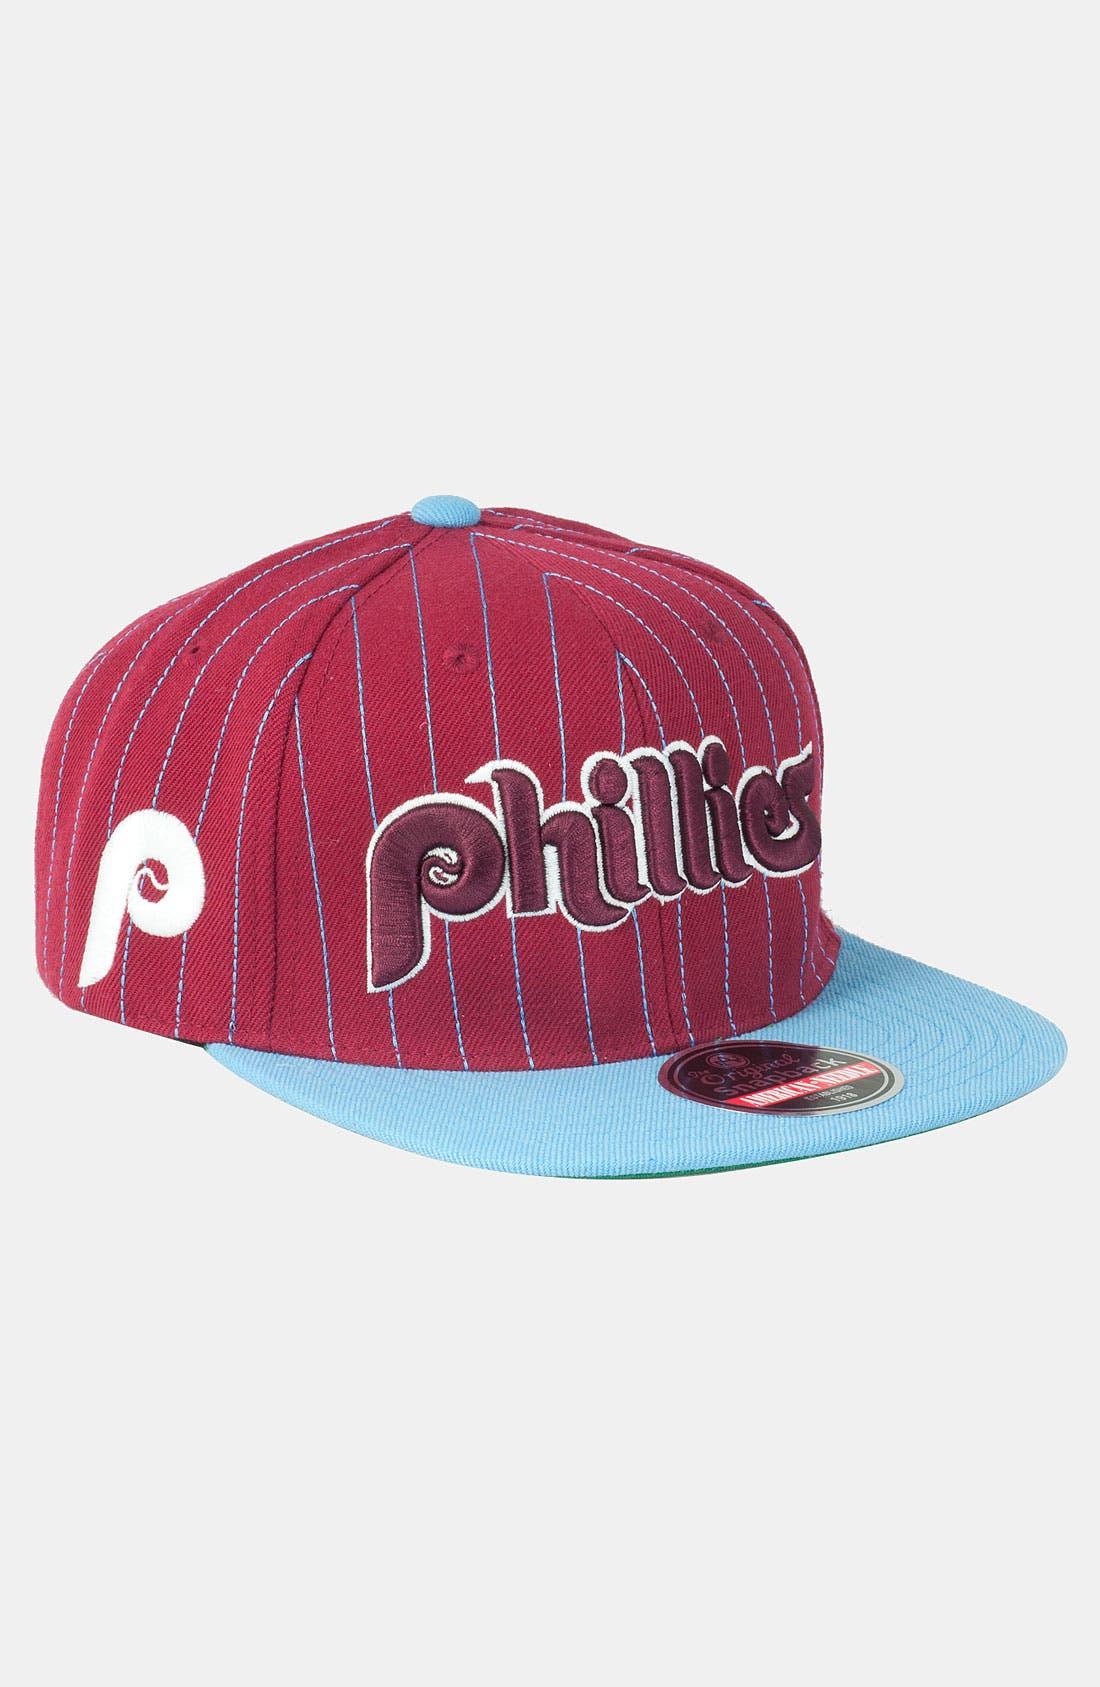 Main Image - American Needle 'Phillies' Snapback Baseball Cap